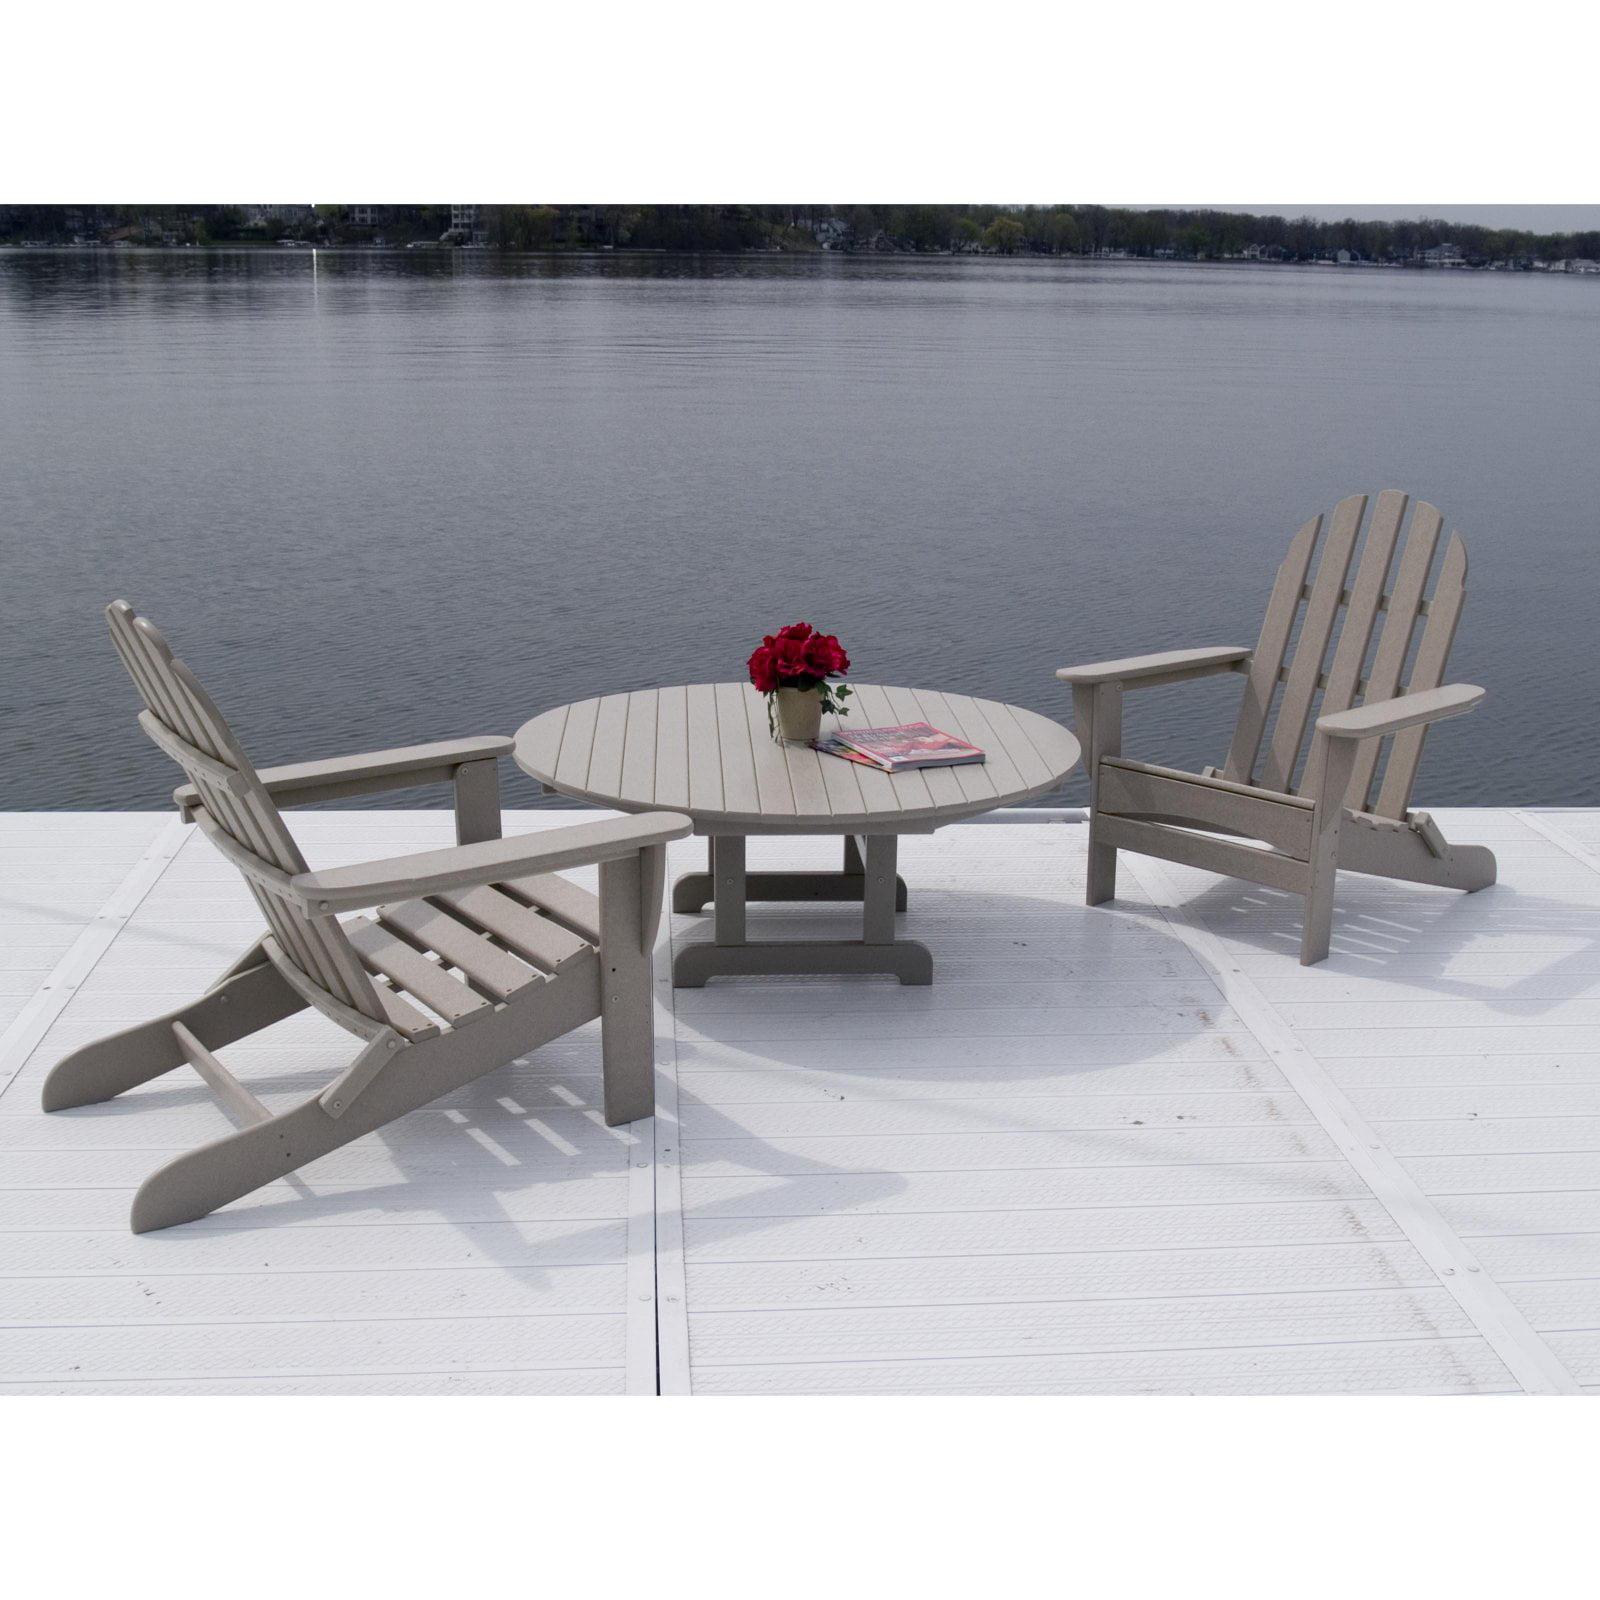 POLYWOOD® Curved Back Adirondack 3 pc. Conversation Patio Set